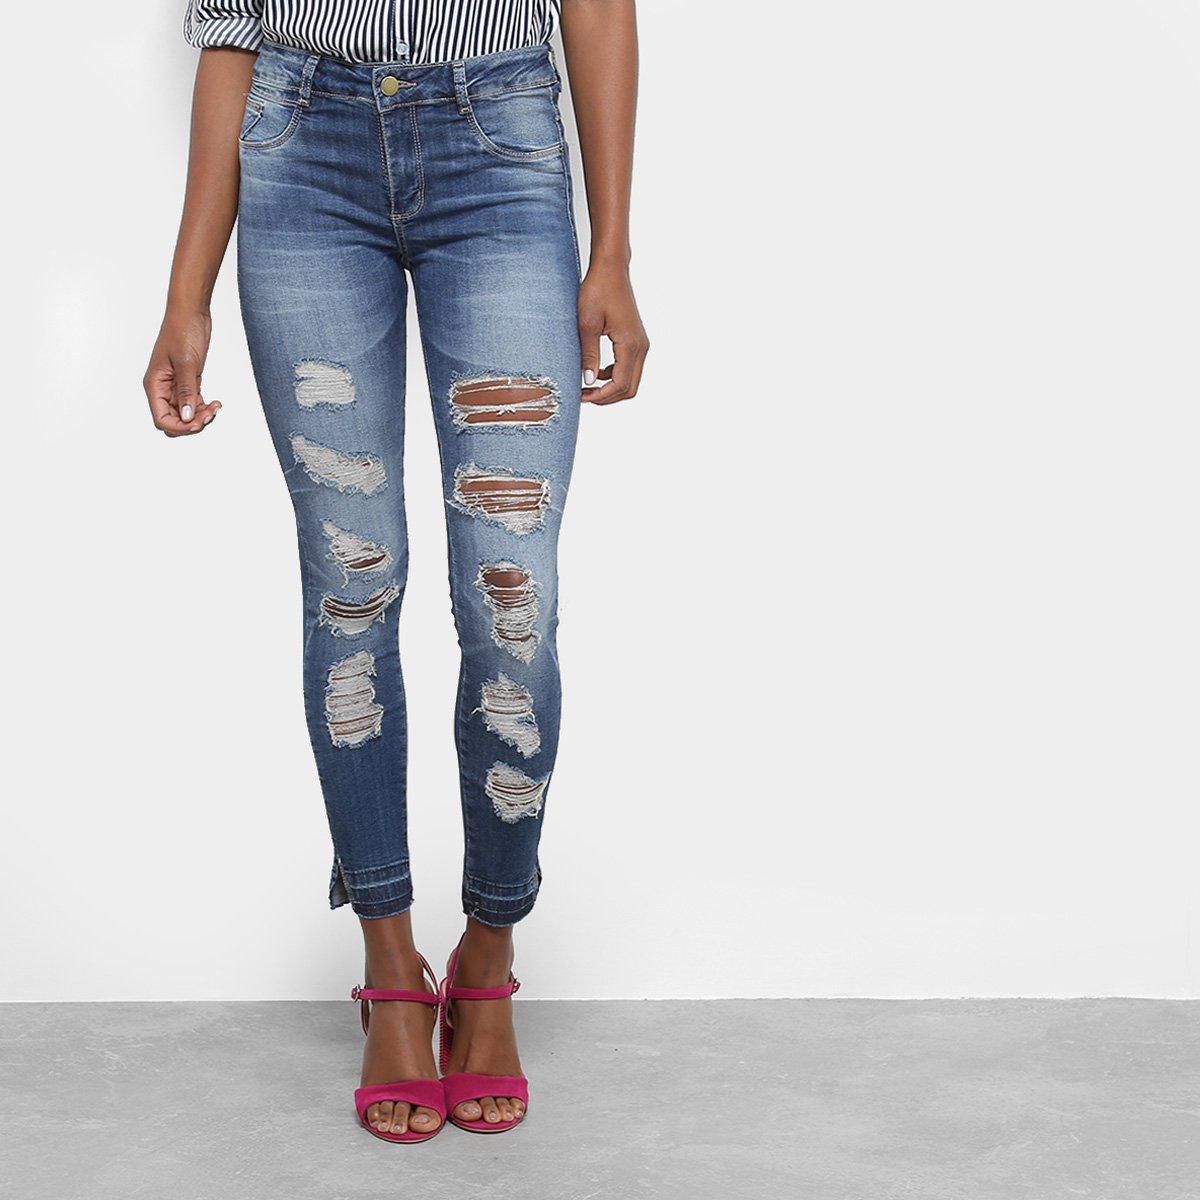 Calça Jeans Skinny Sawary Destroyed Cintura Média Feminina - Compre ... 41ddd69a4871b